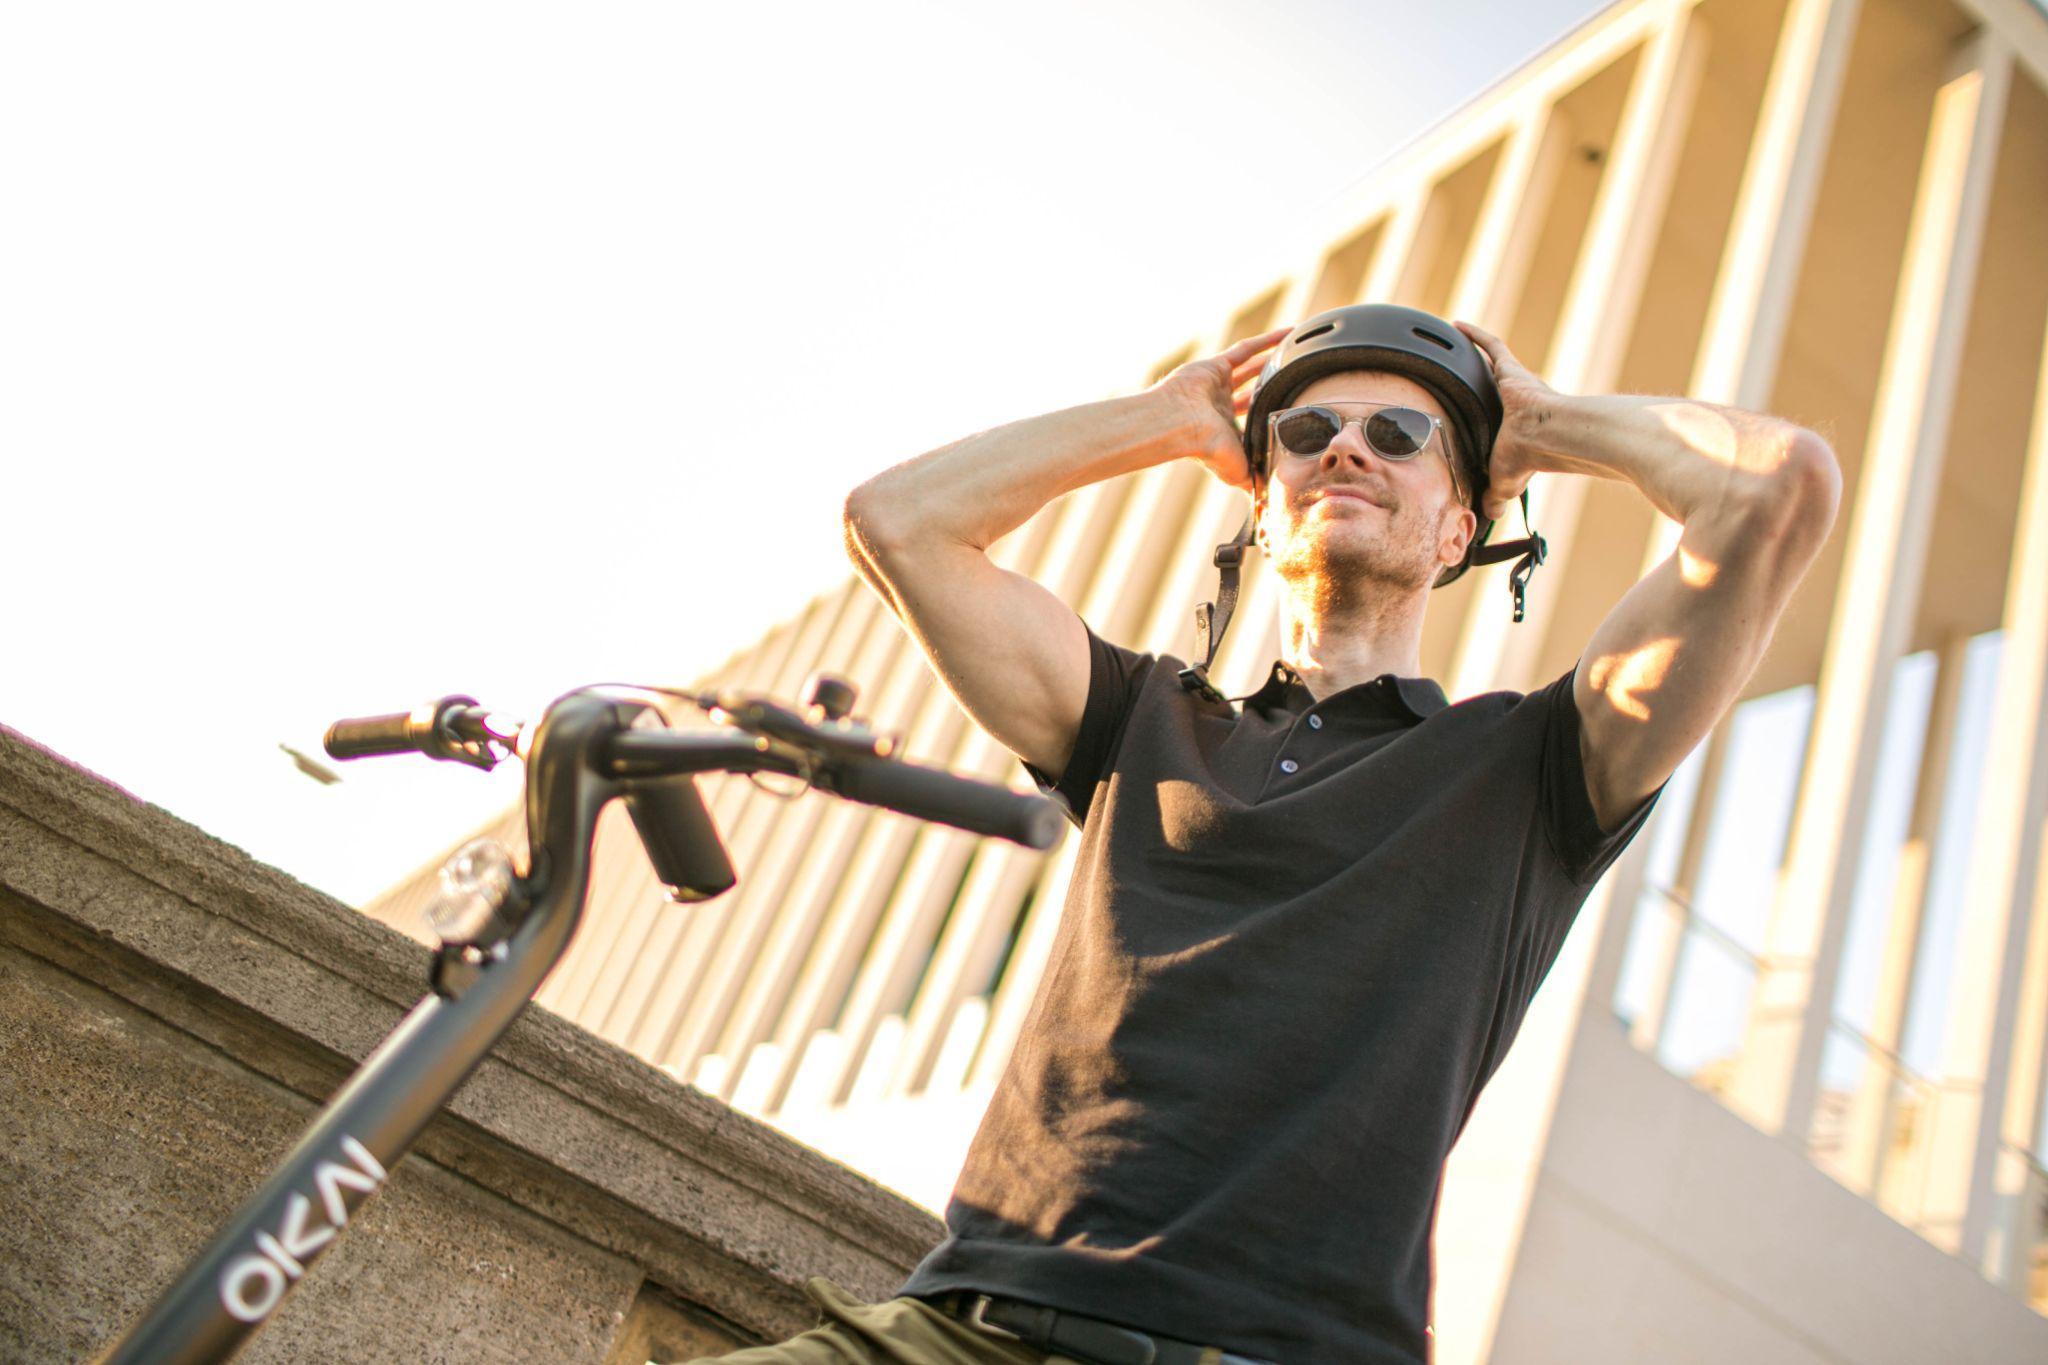 a man riding a scooter